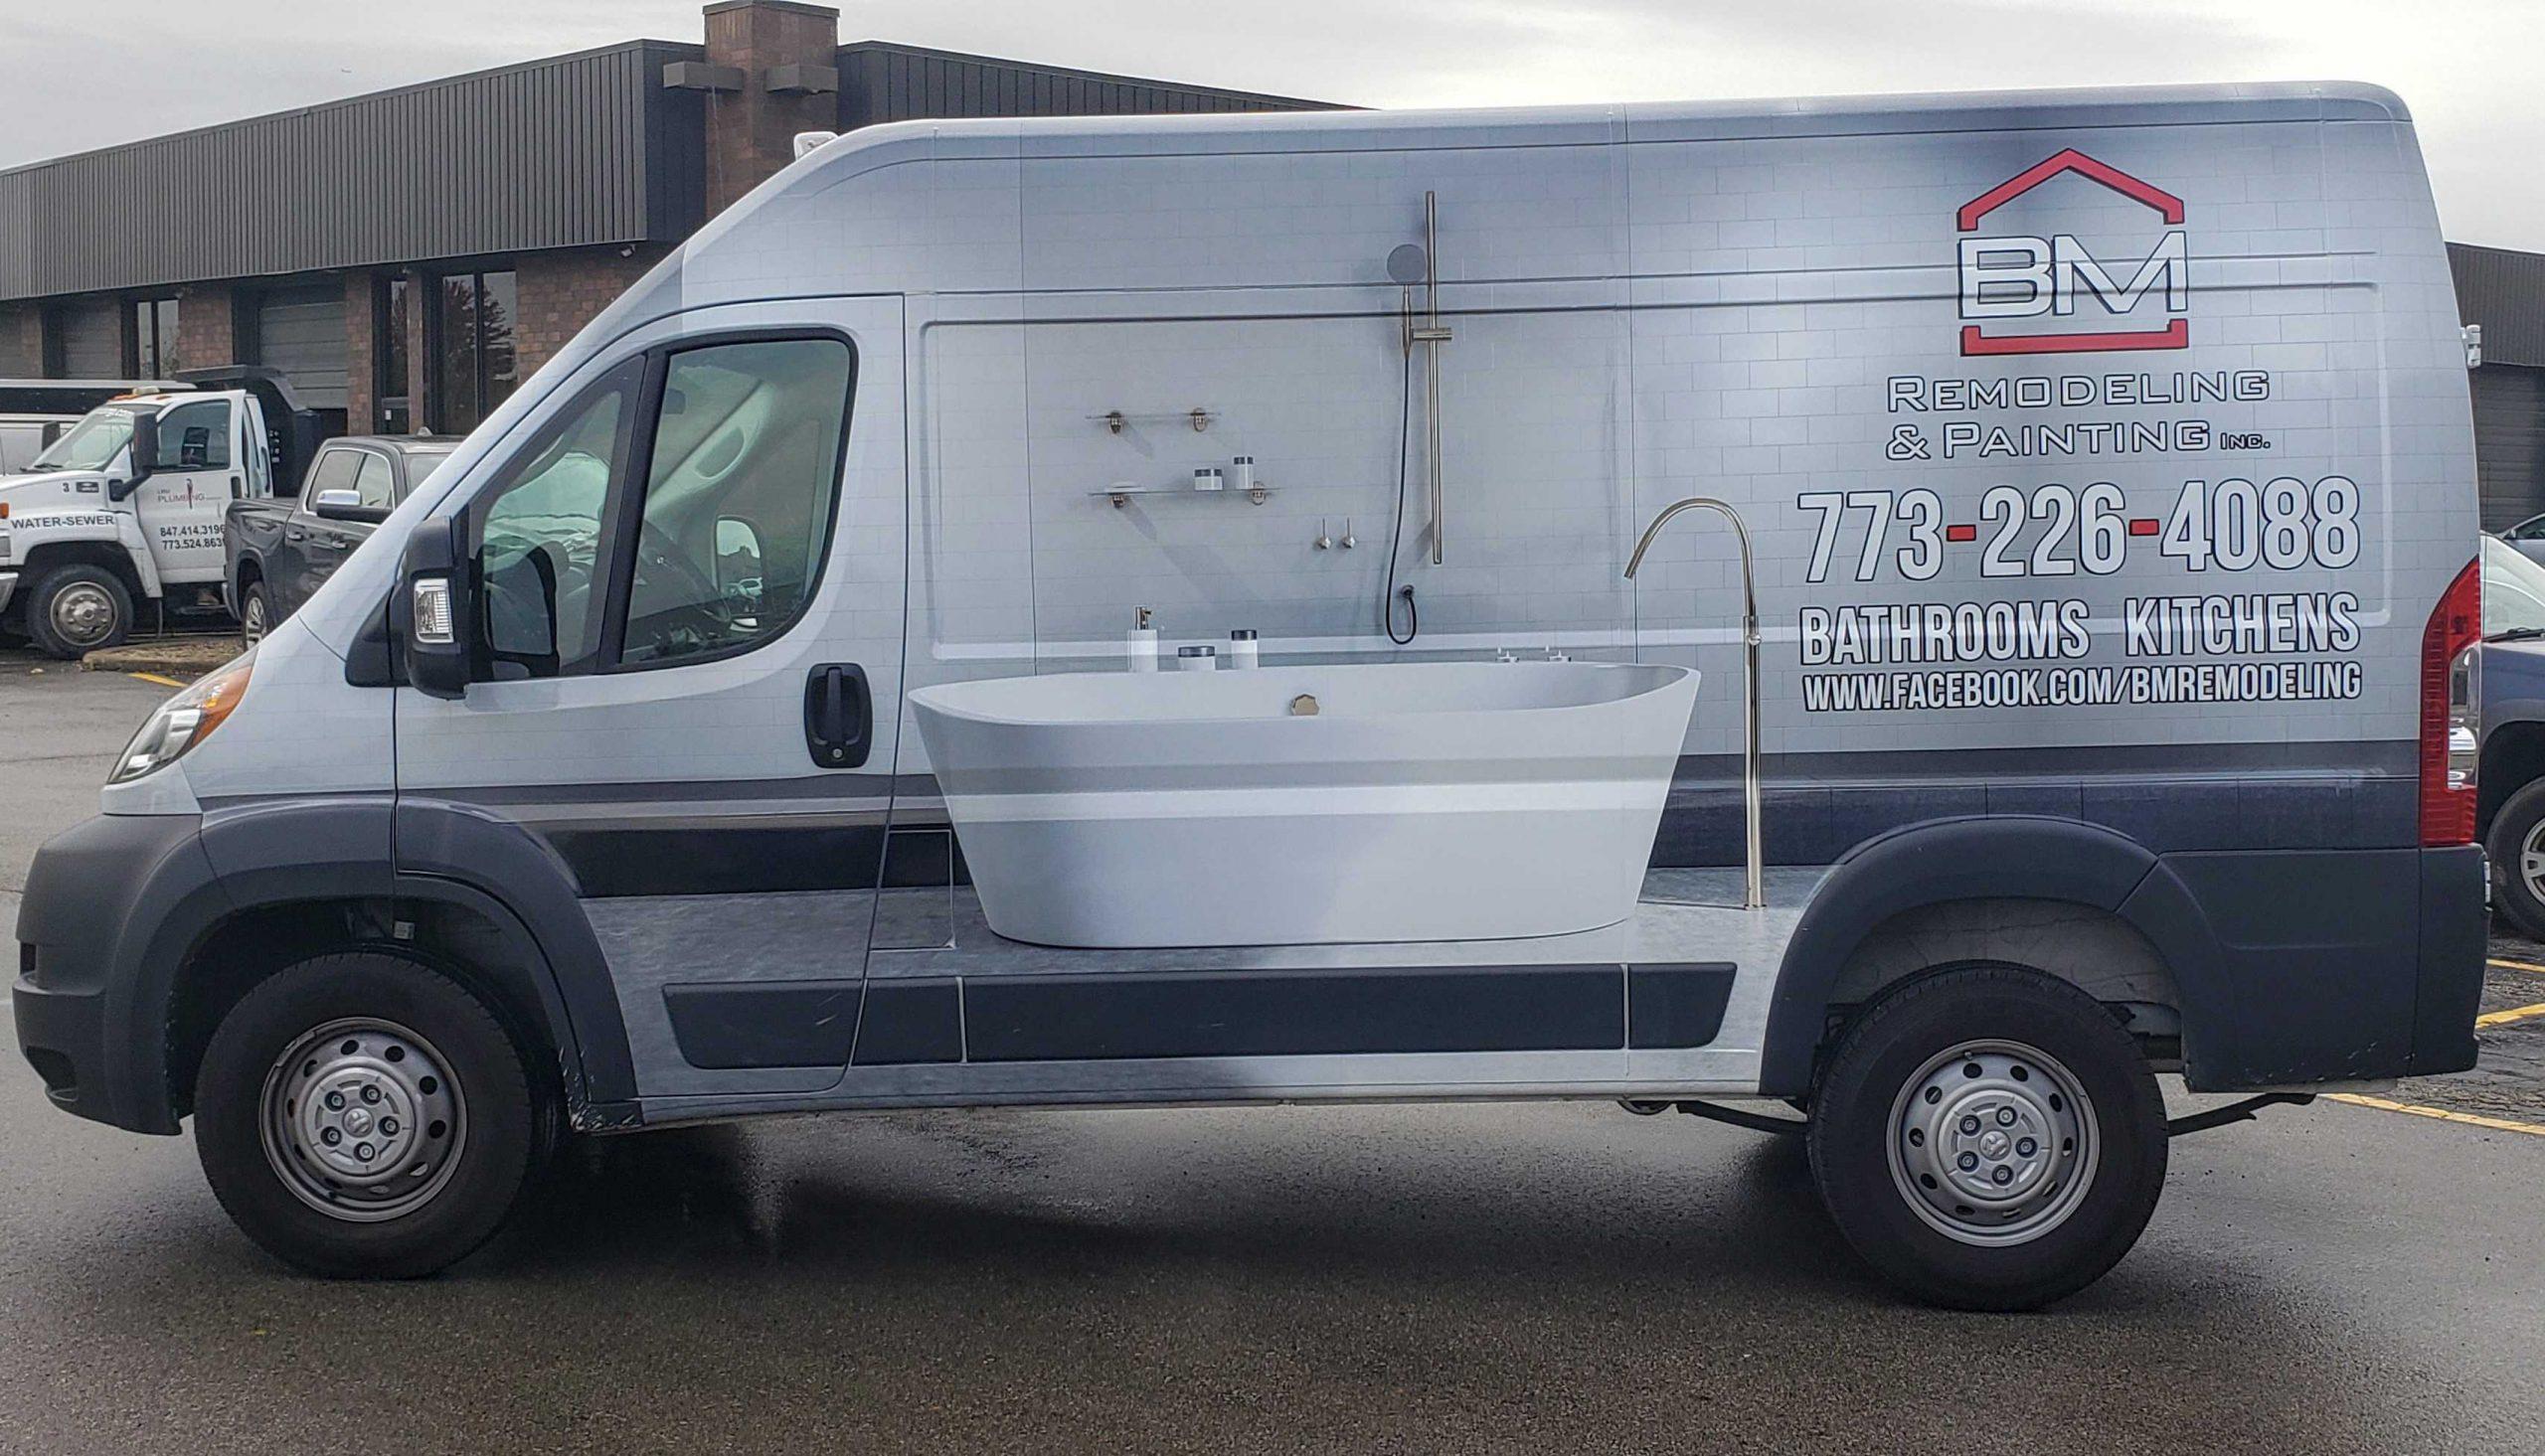 bm-remodeling-company